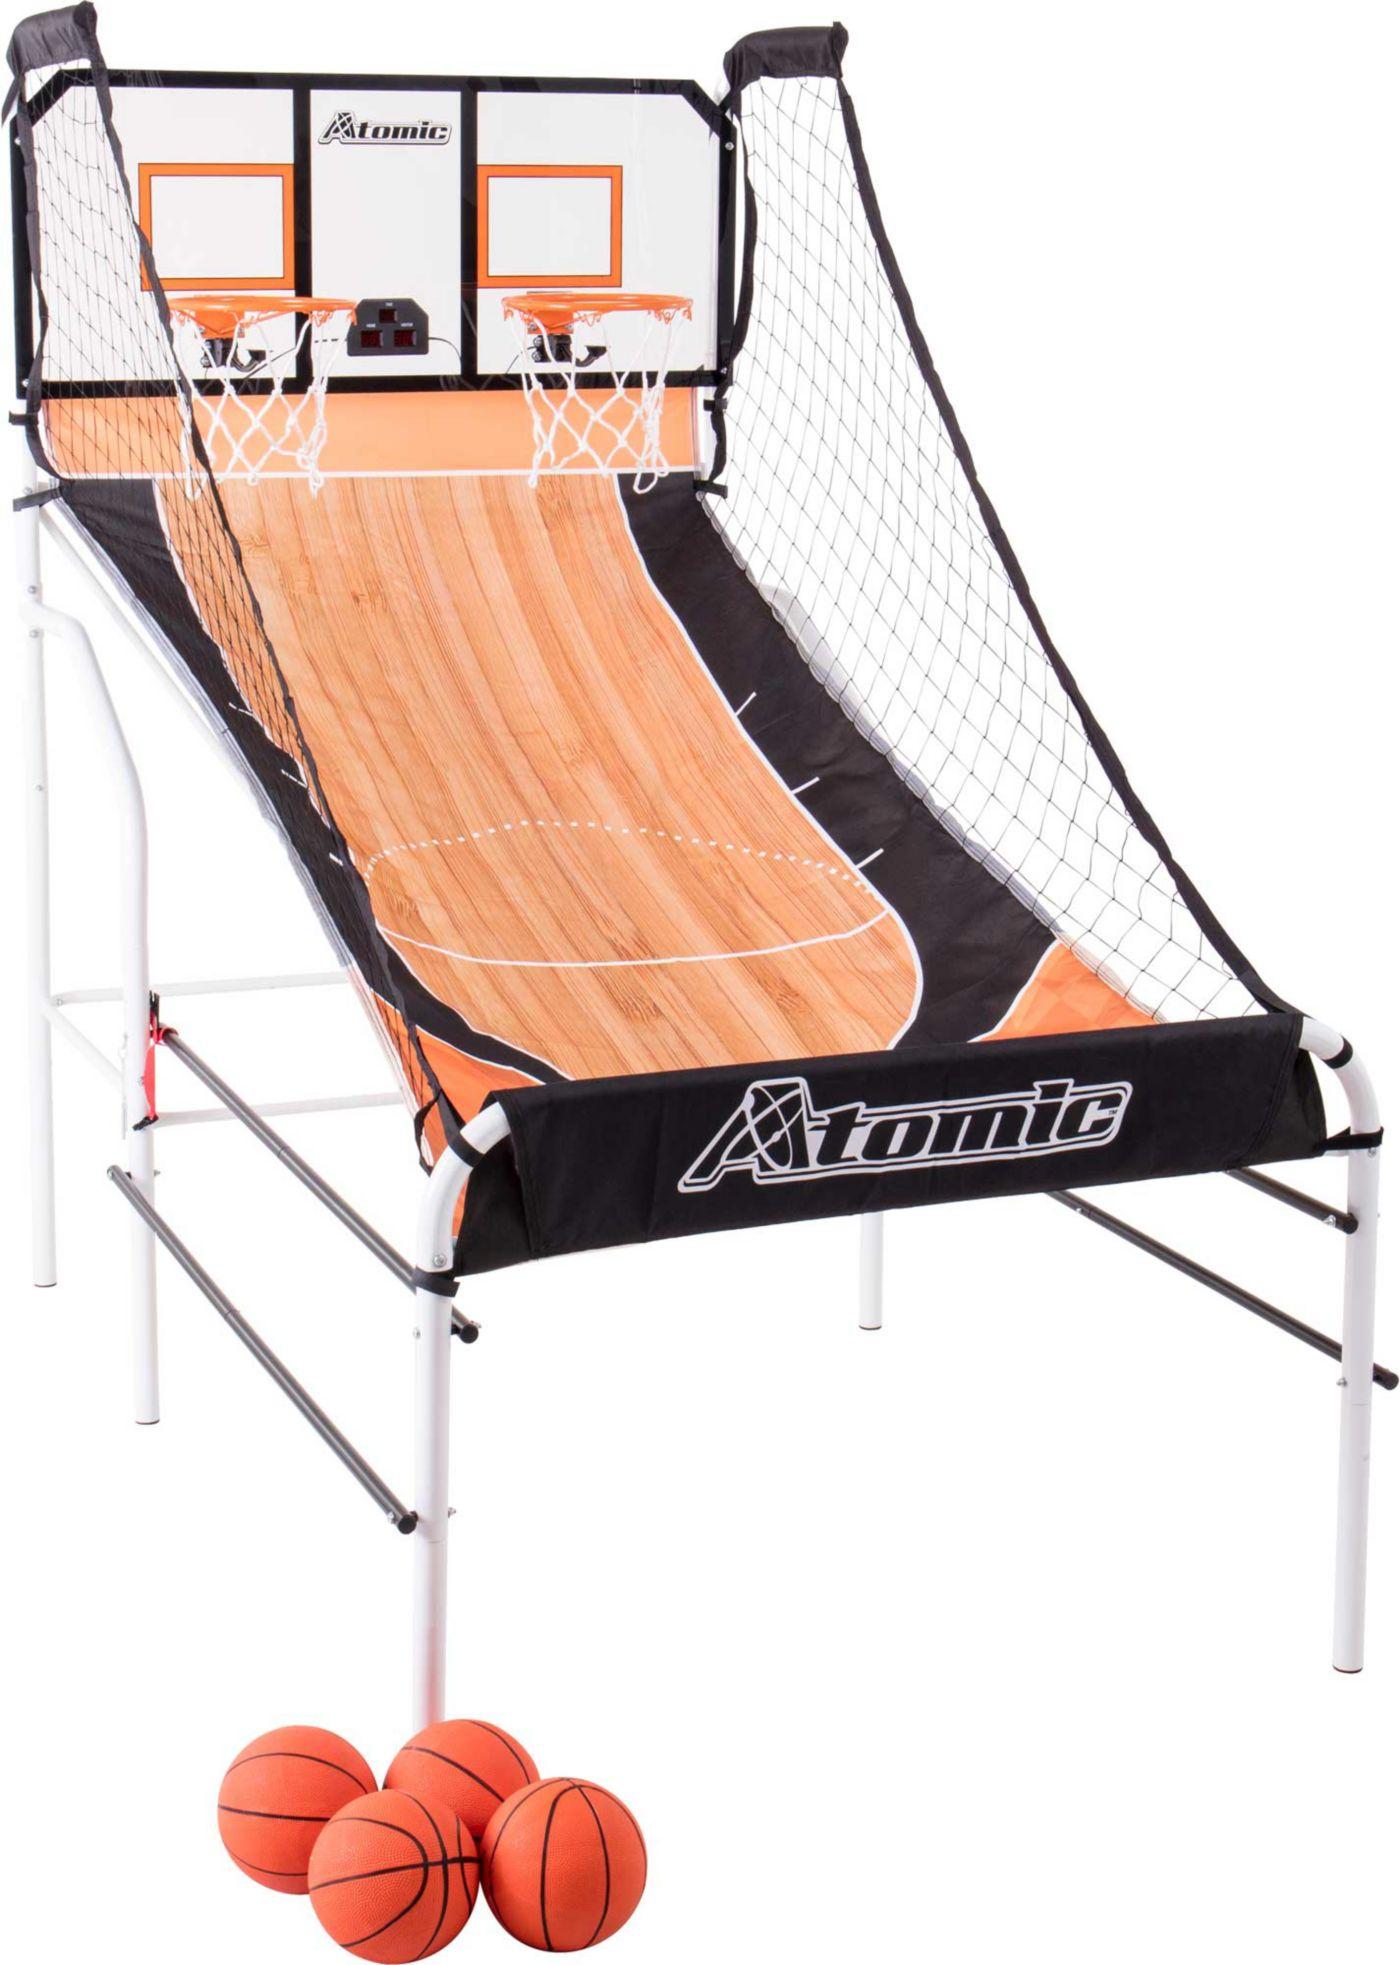 Atomic Slam Dunk Basketball Shootout